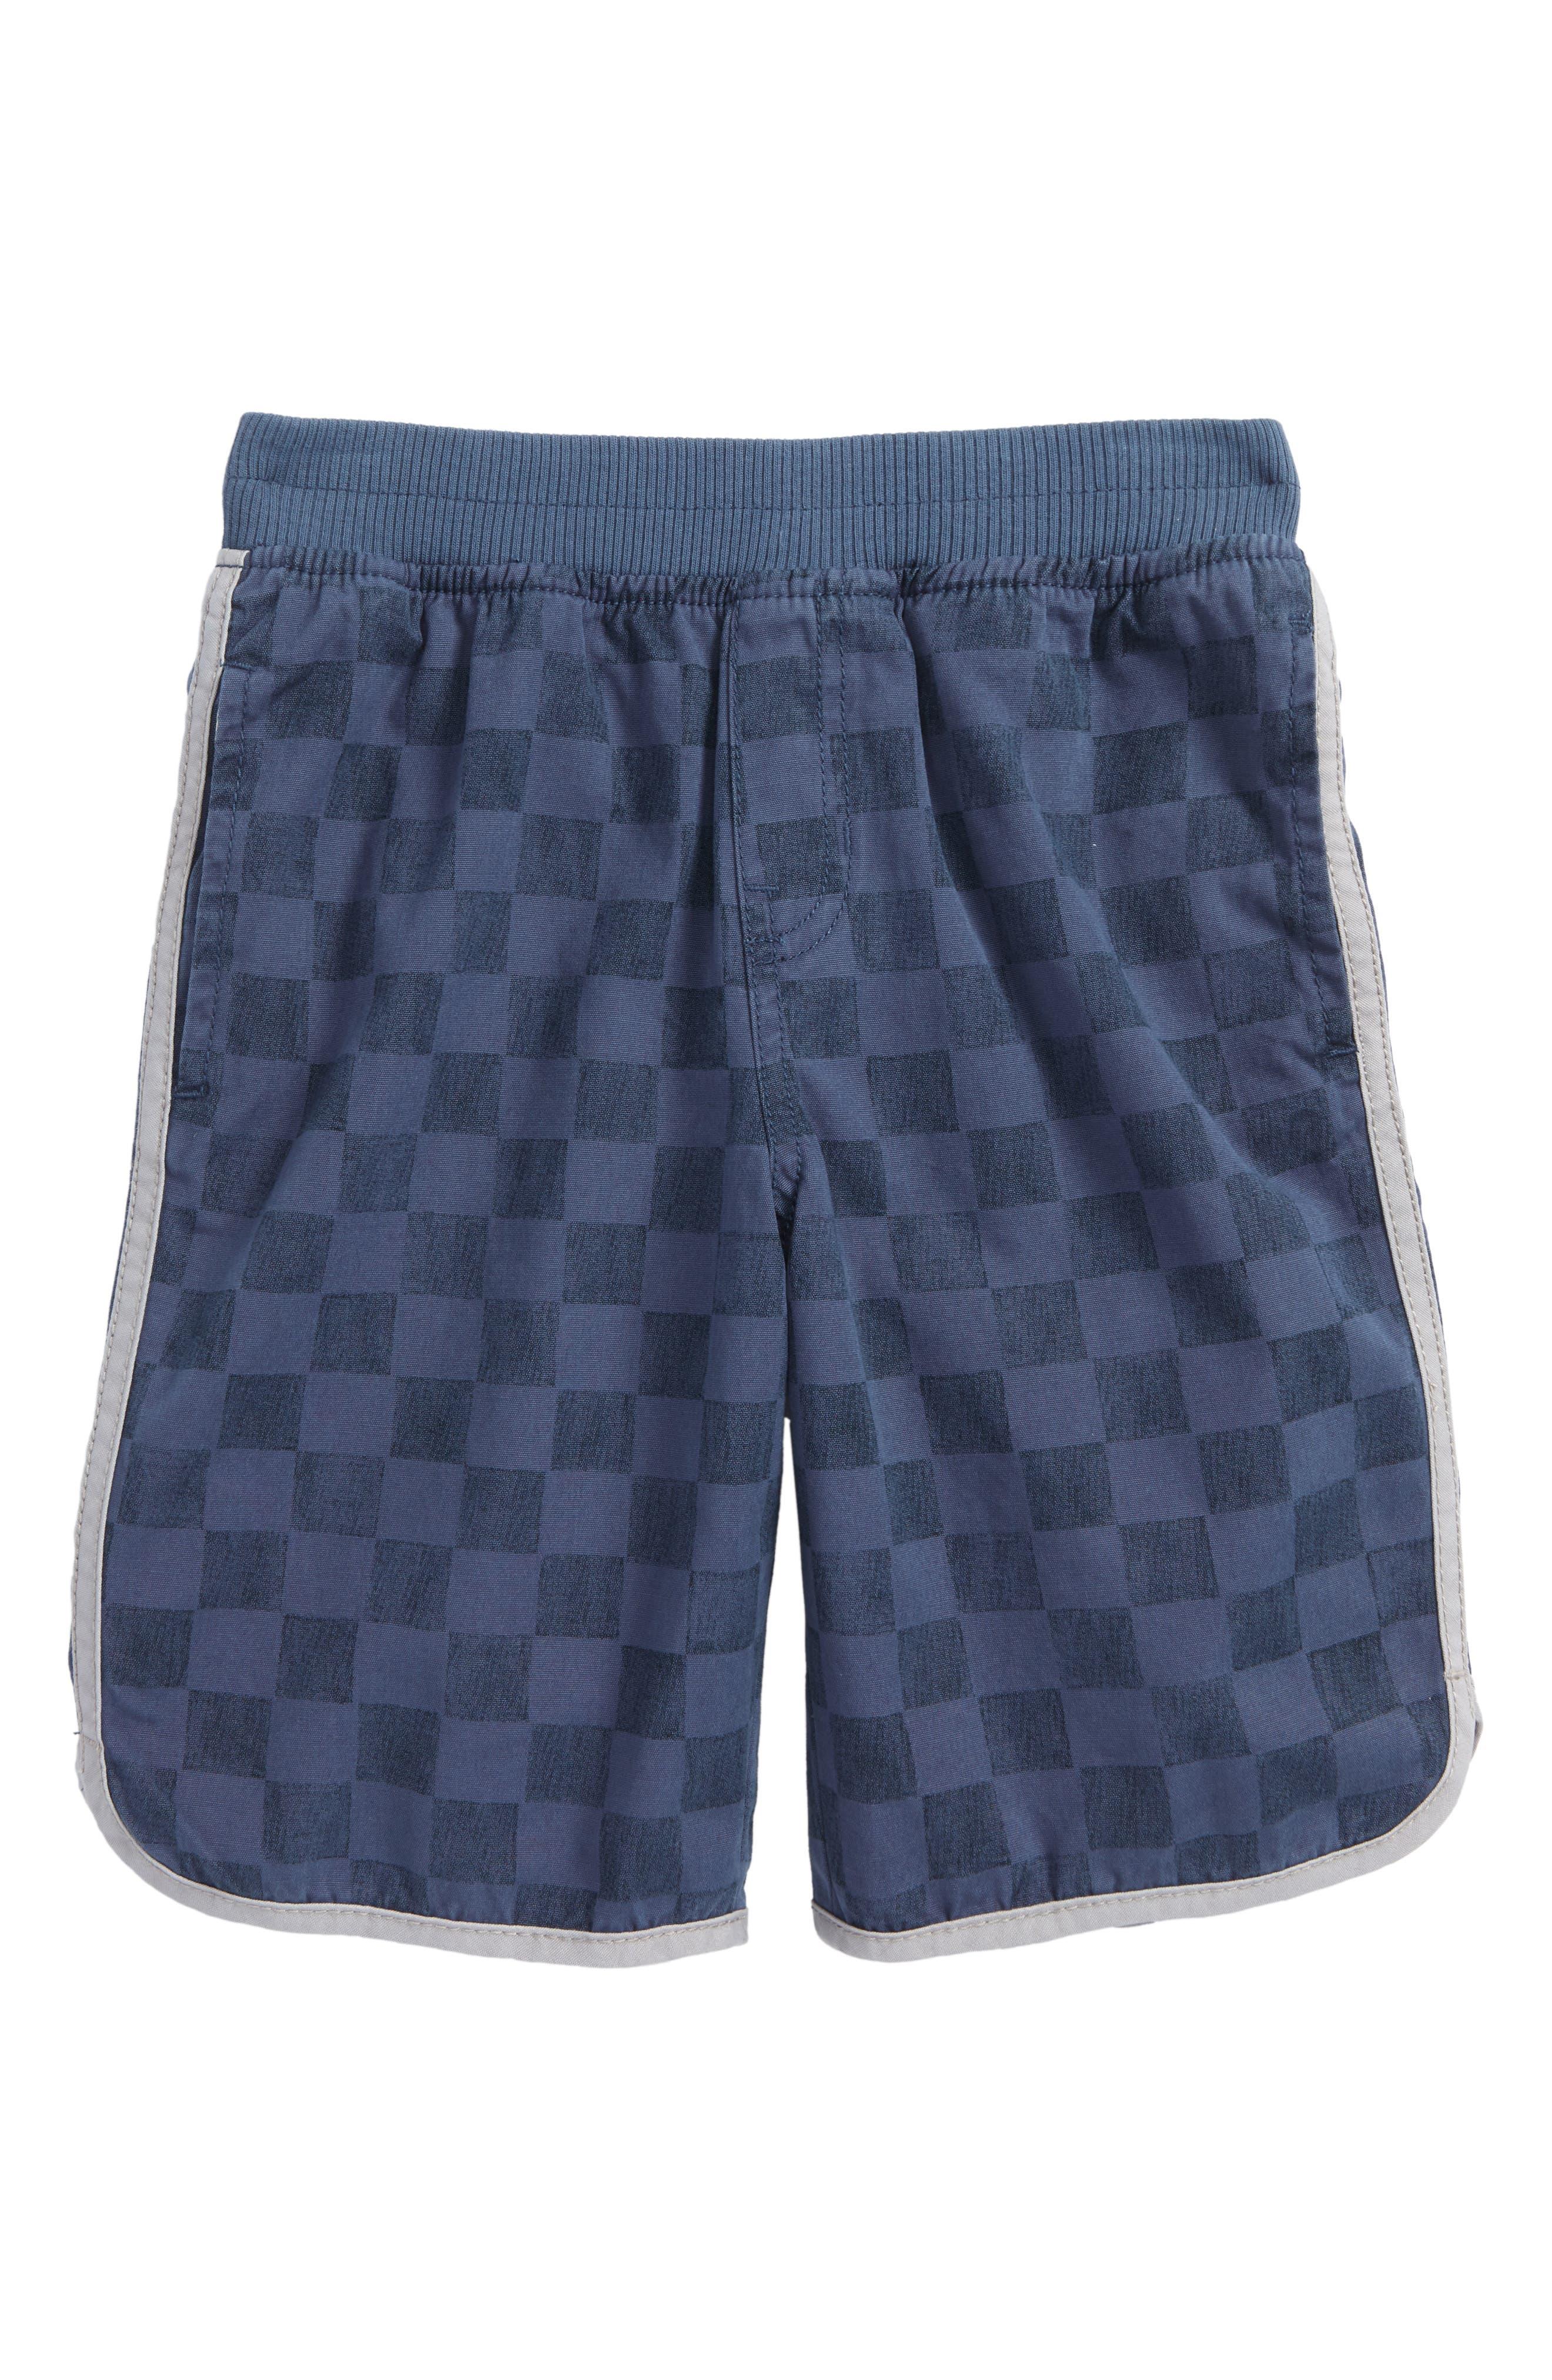 Piped Shorts,                             Main thumbnail 1, color,                             Loch Blue Checkerboard